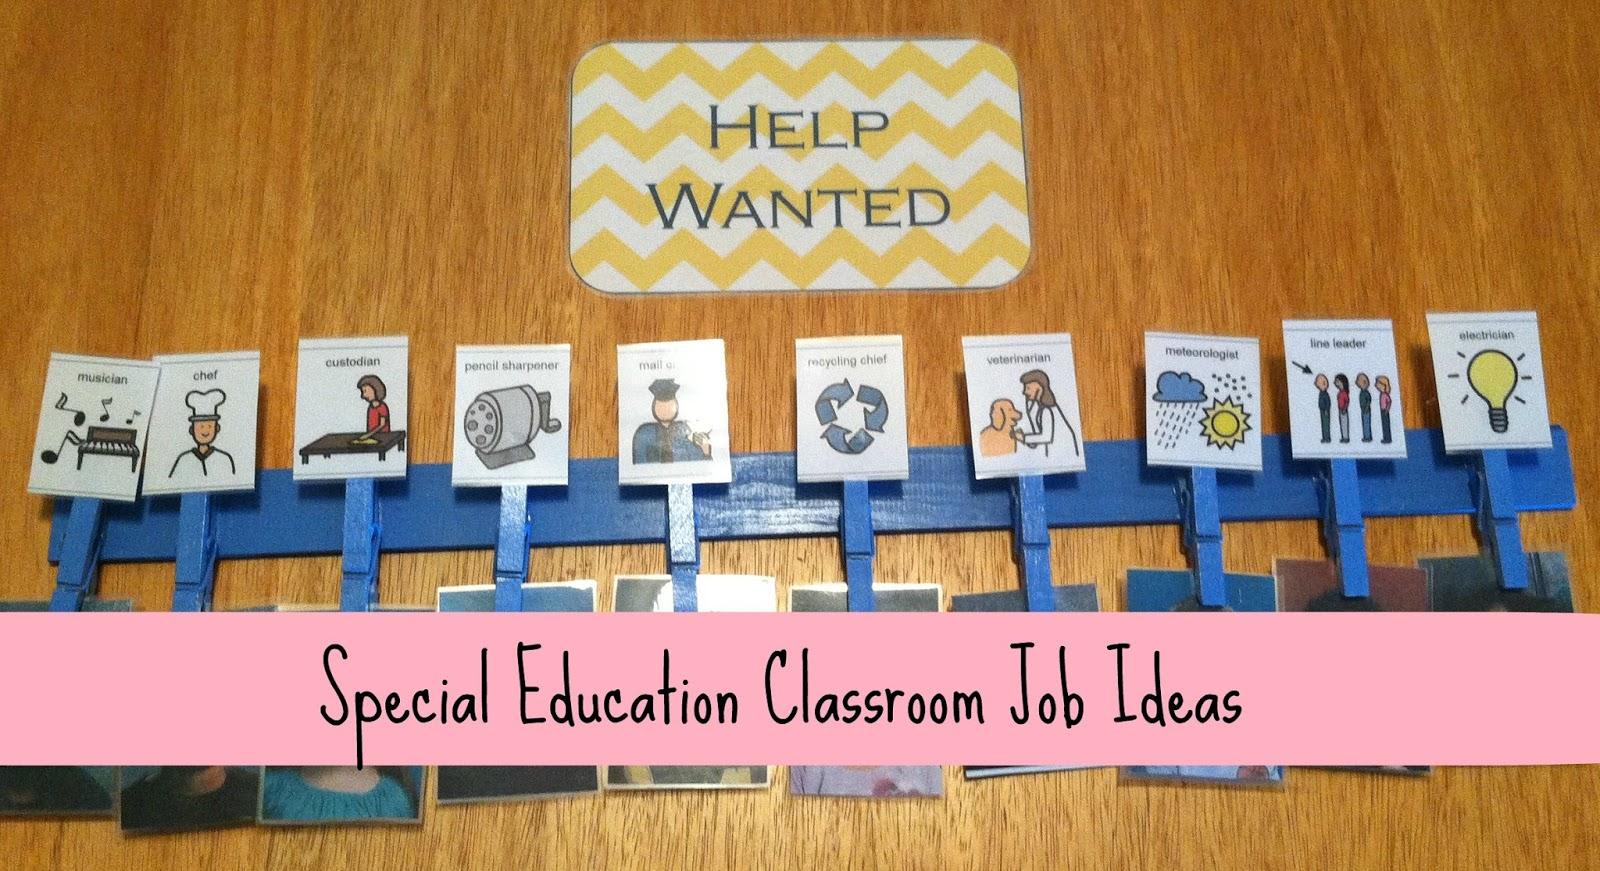 Little Miss Kim S Class Special Education Classroom Job